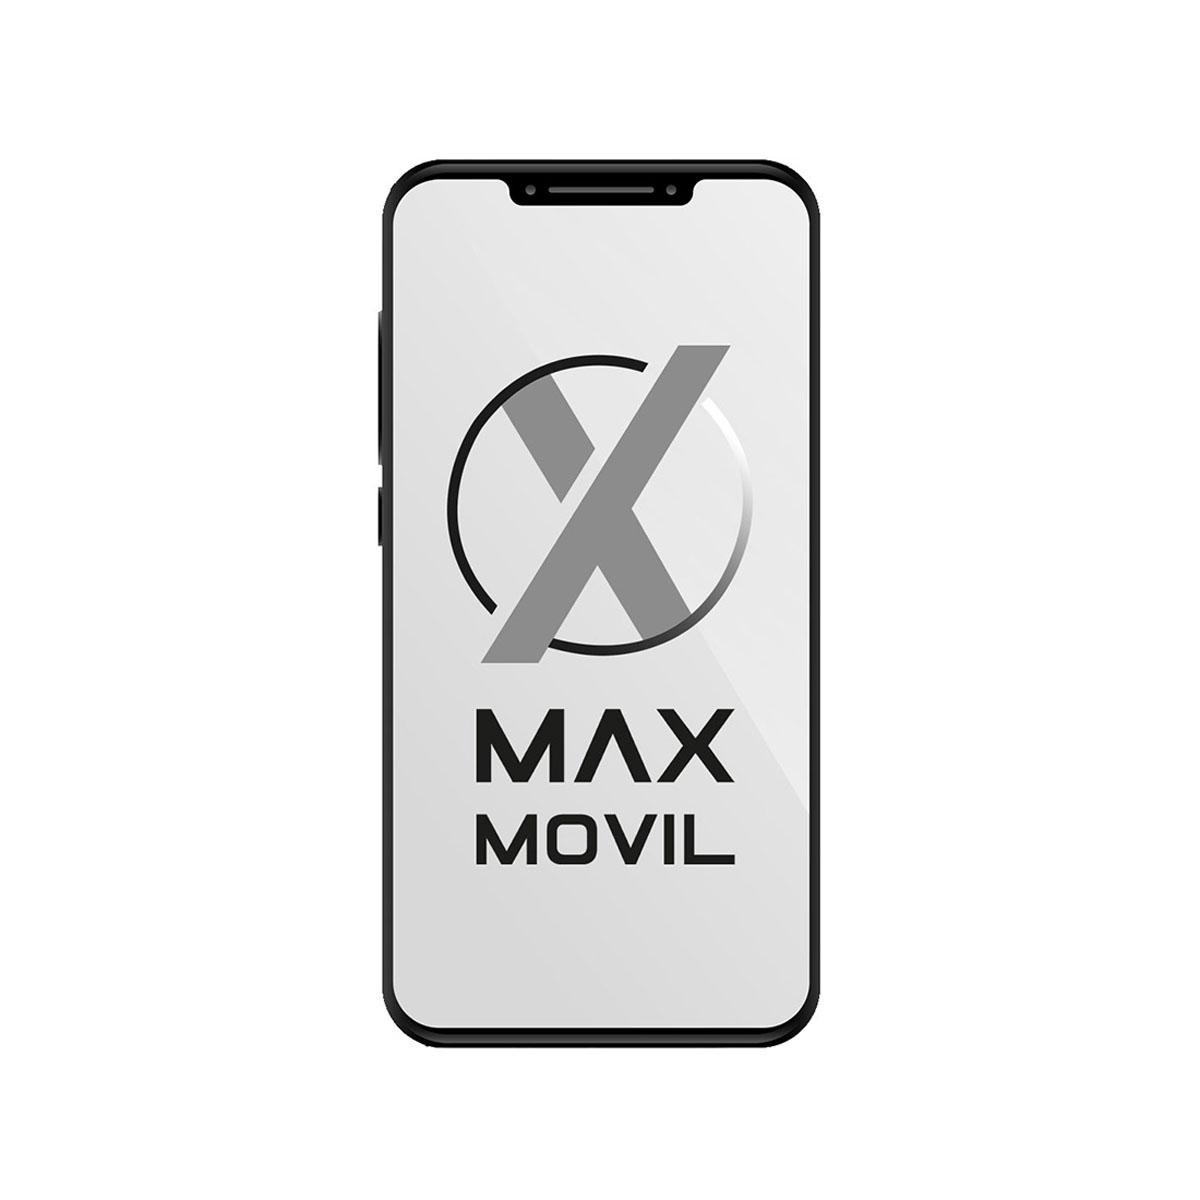 Motorola One Macro 4GB/64GB Azul (Space Blue) Dual SIM XT2016-1